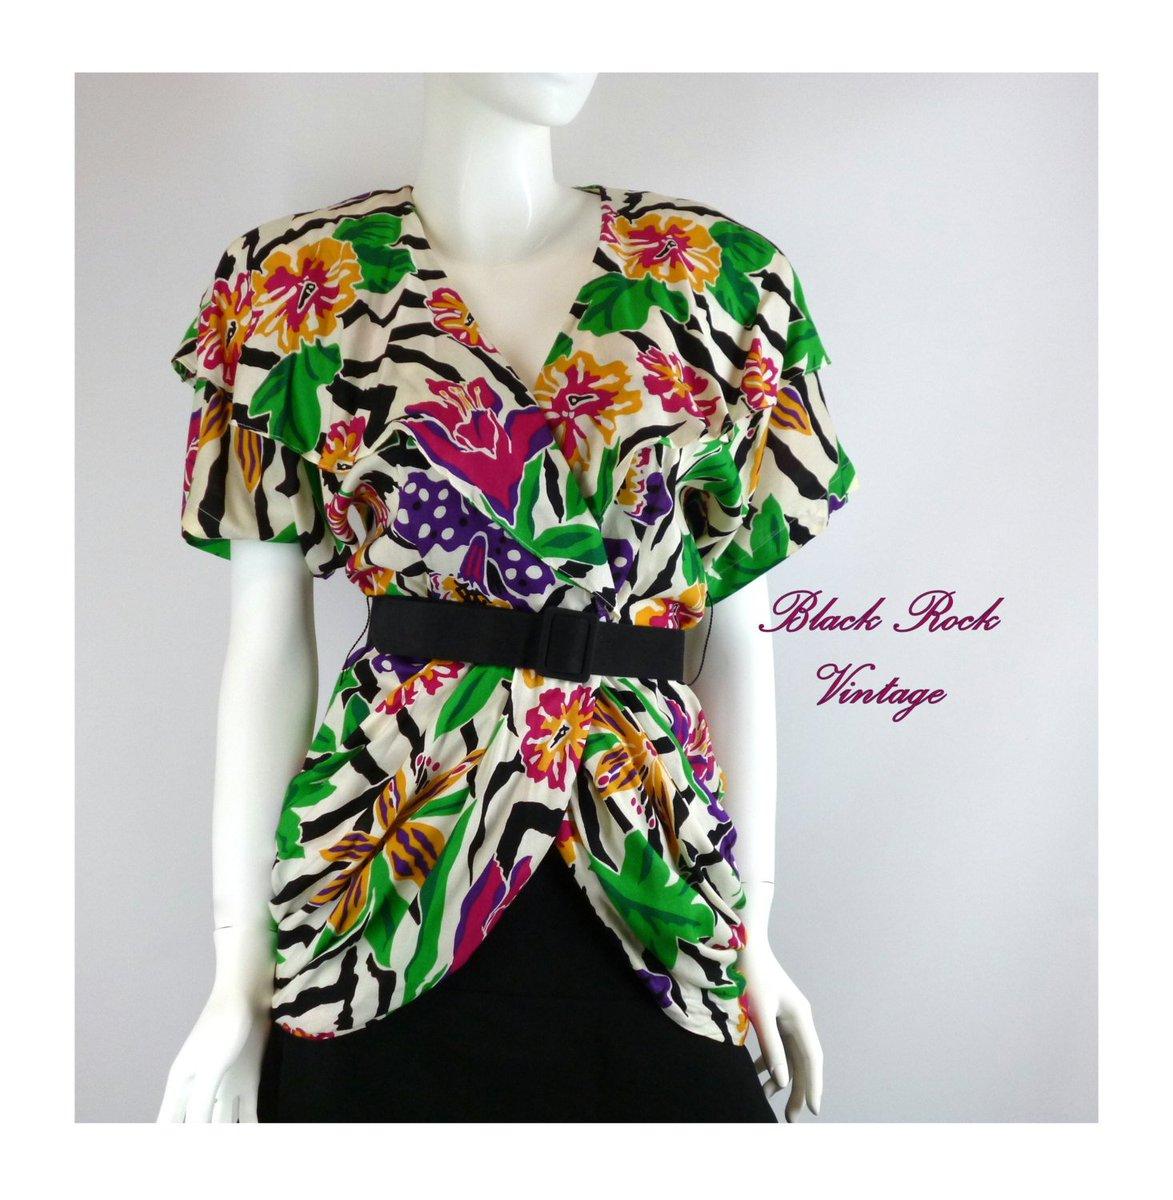 Floral Jacket Tropical Print, Jewel Tones Shawl Collar, Vintage 8… http://etsy.me/2rvVE76 #CouponCode #DrapedBlouse pic.twitter.com/mpF8tth5ha